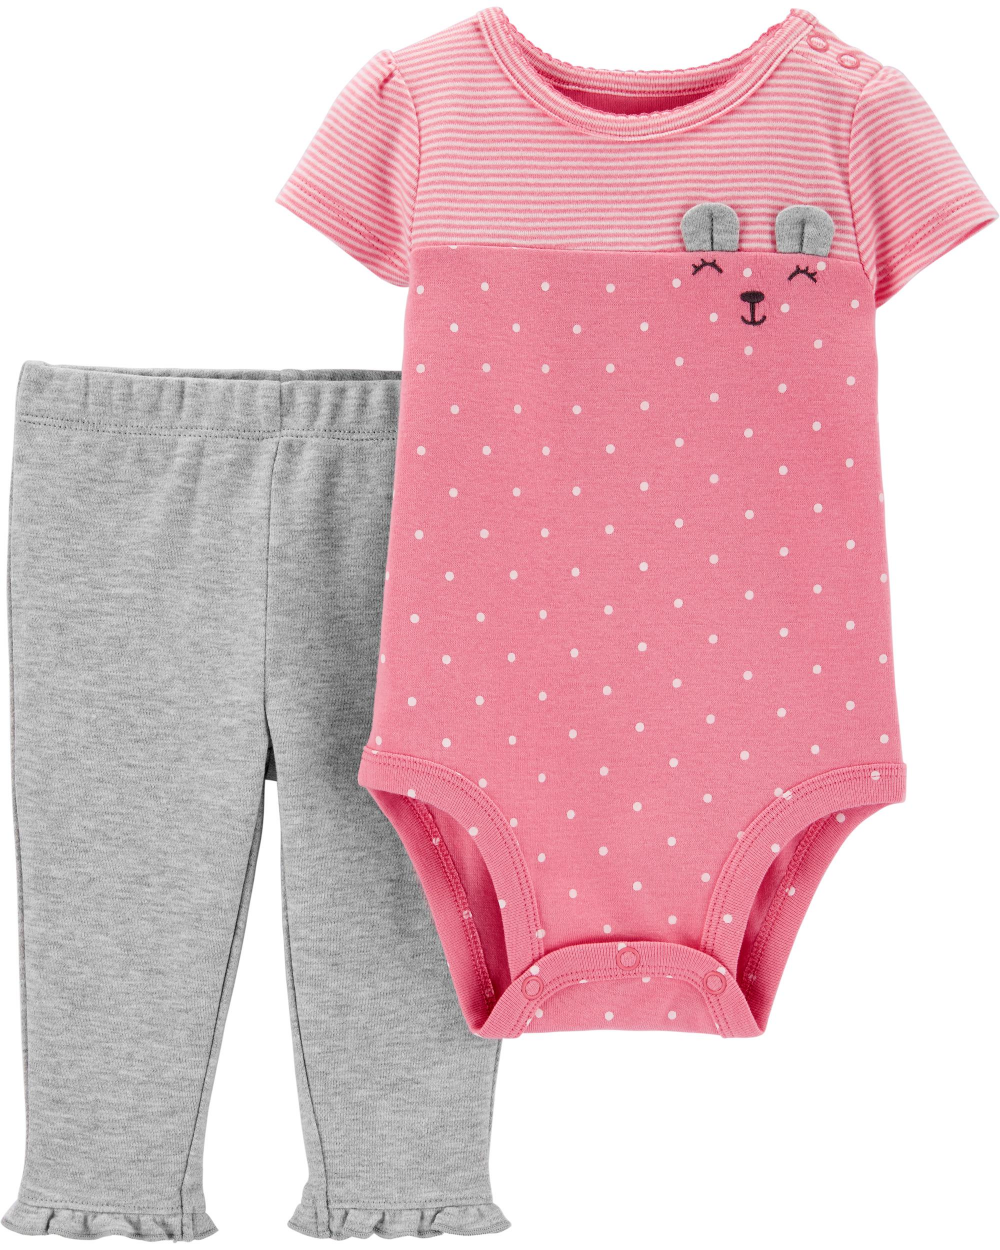 Ruffle Dots Pull-On Pants Carters Baby Girls 2-pk